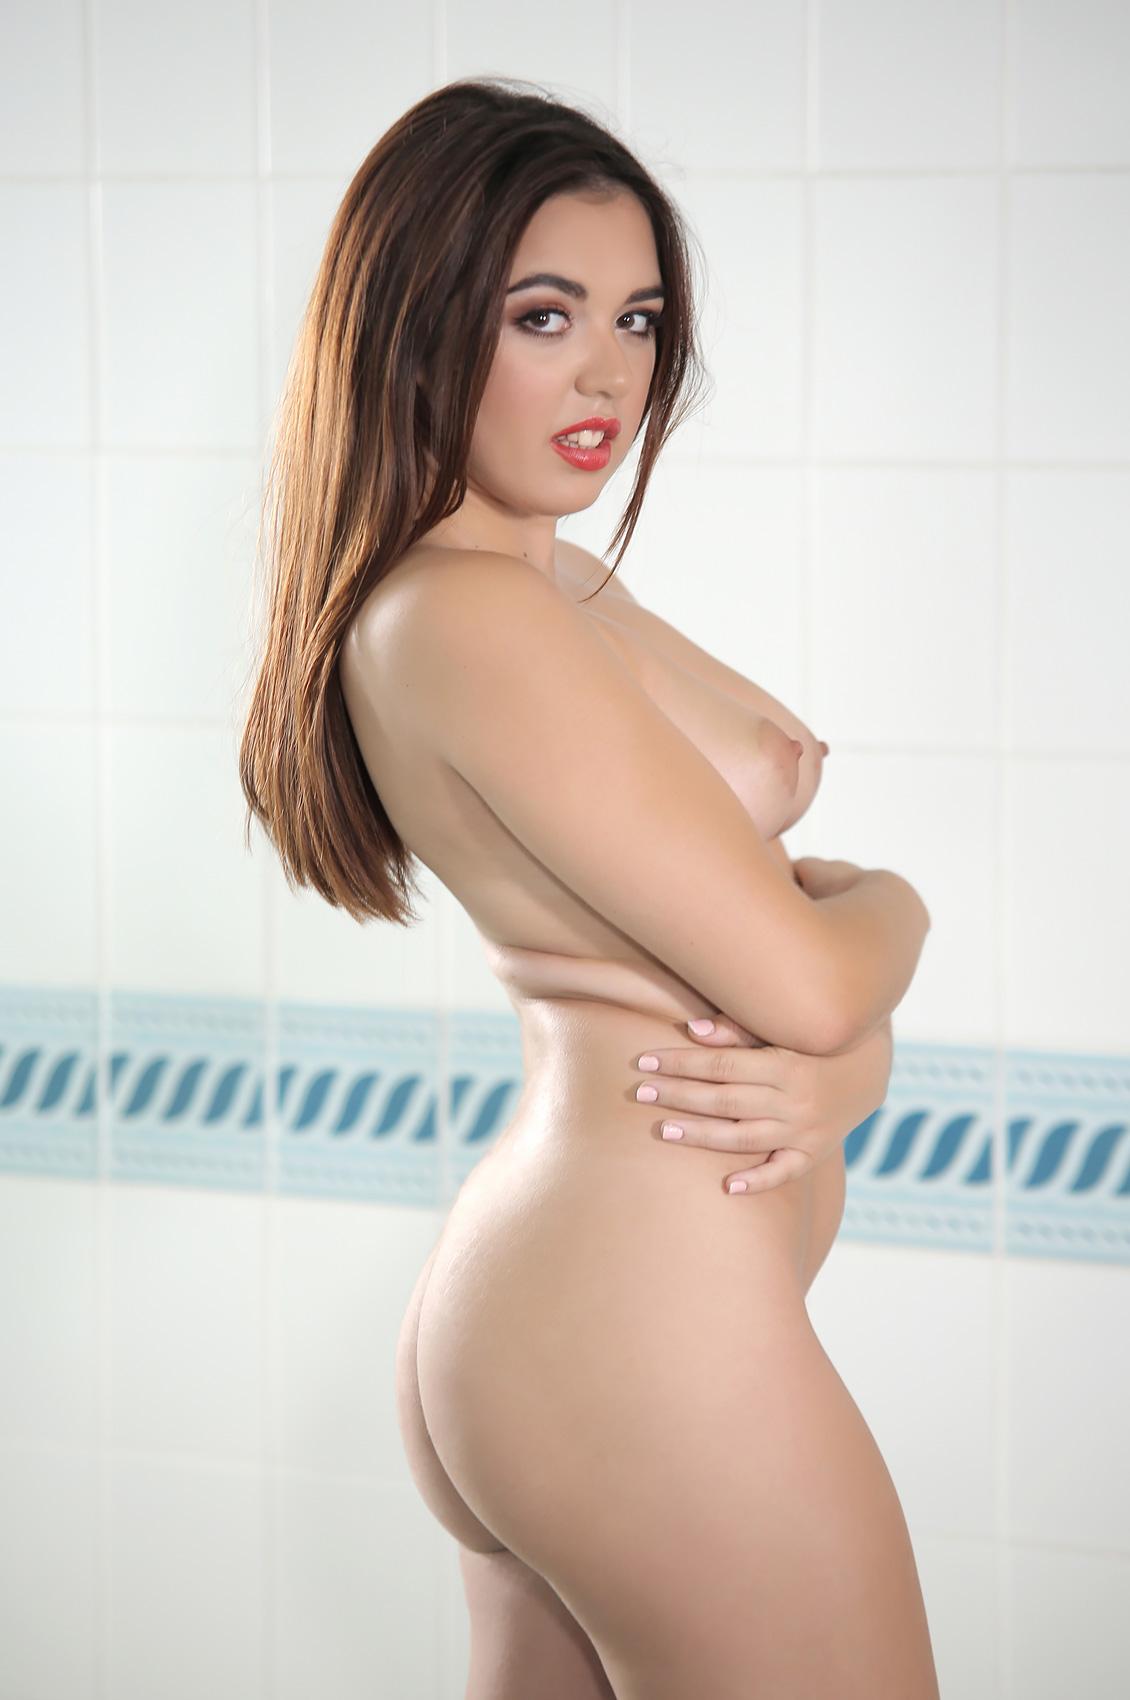 Diana Rius's VR Porn Videos, Bio & Free Nude Pics